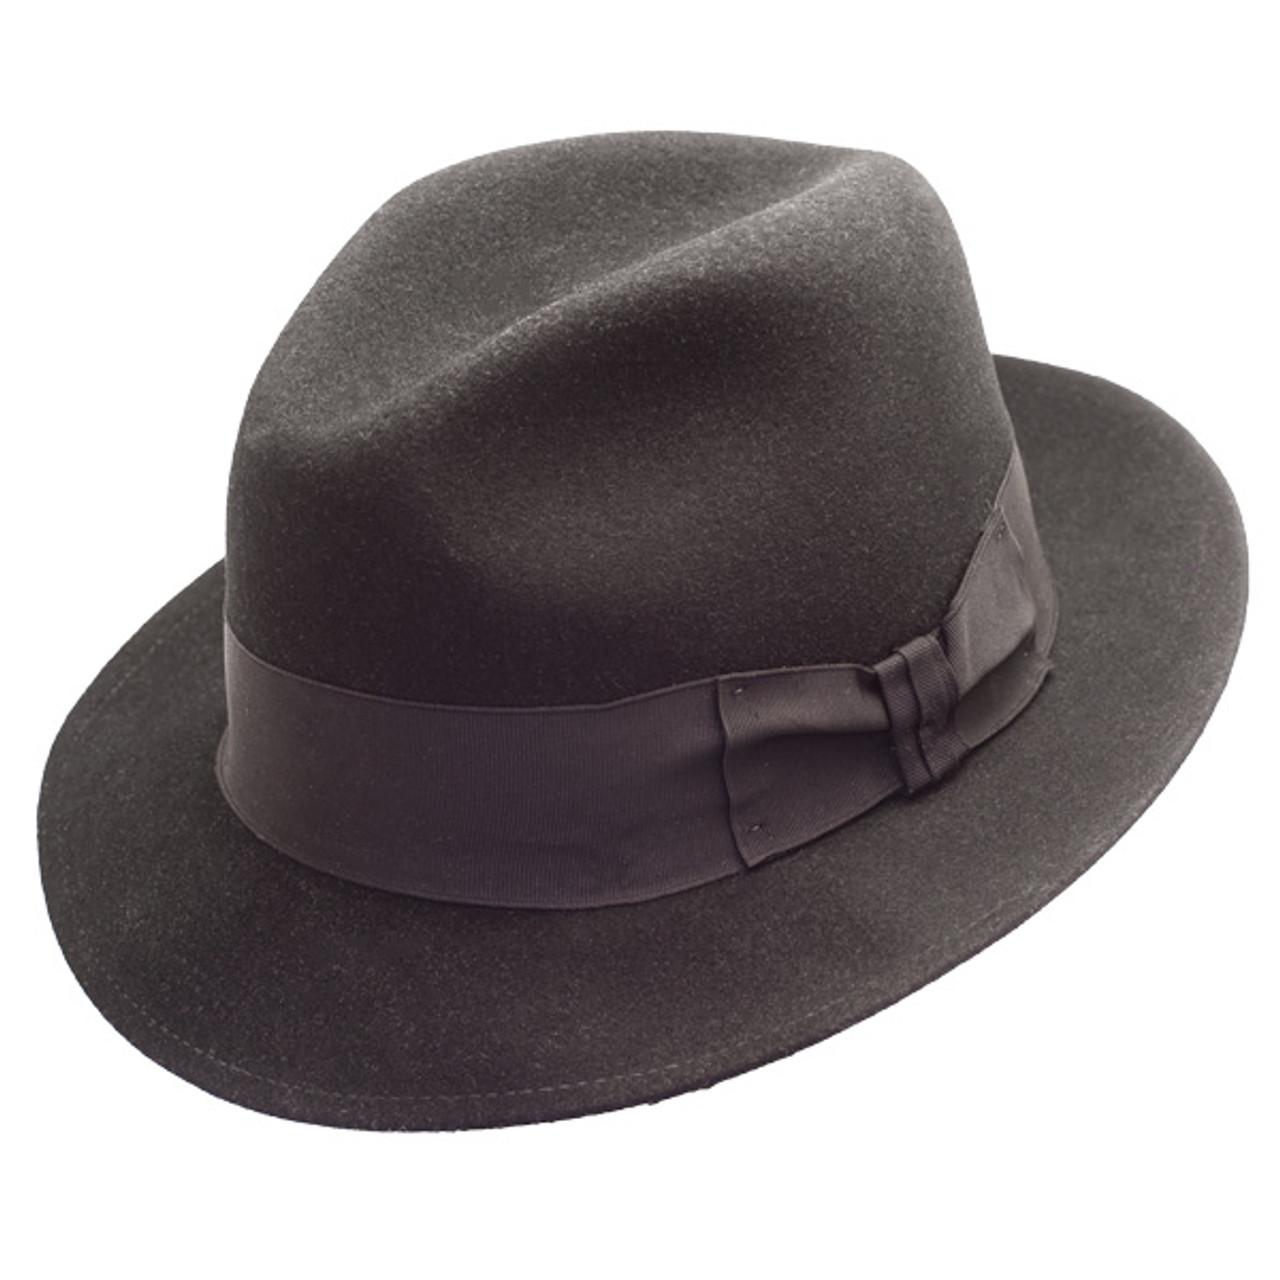 bee02e6febd235 Stetson | Wool Felt Frederick Fedora| Hats Unlimited